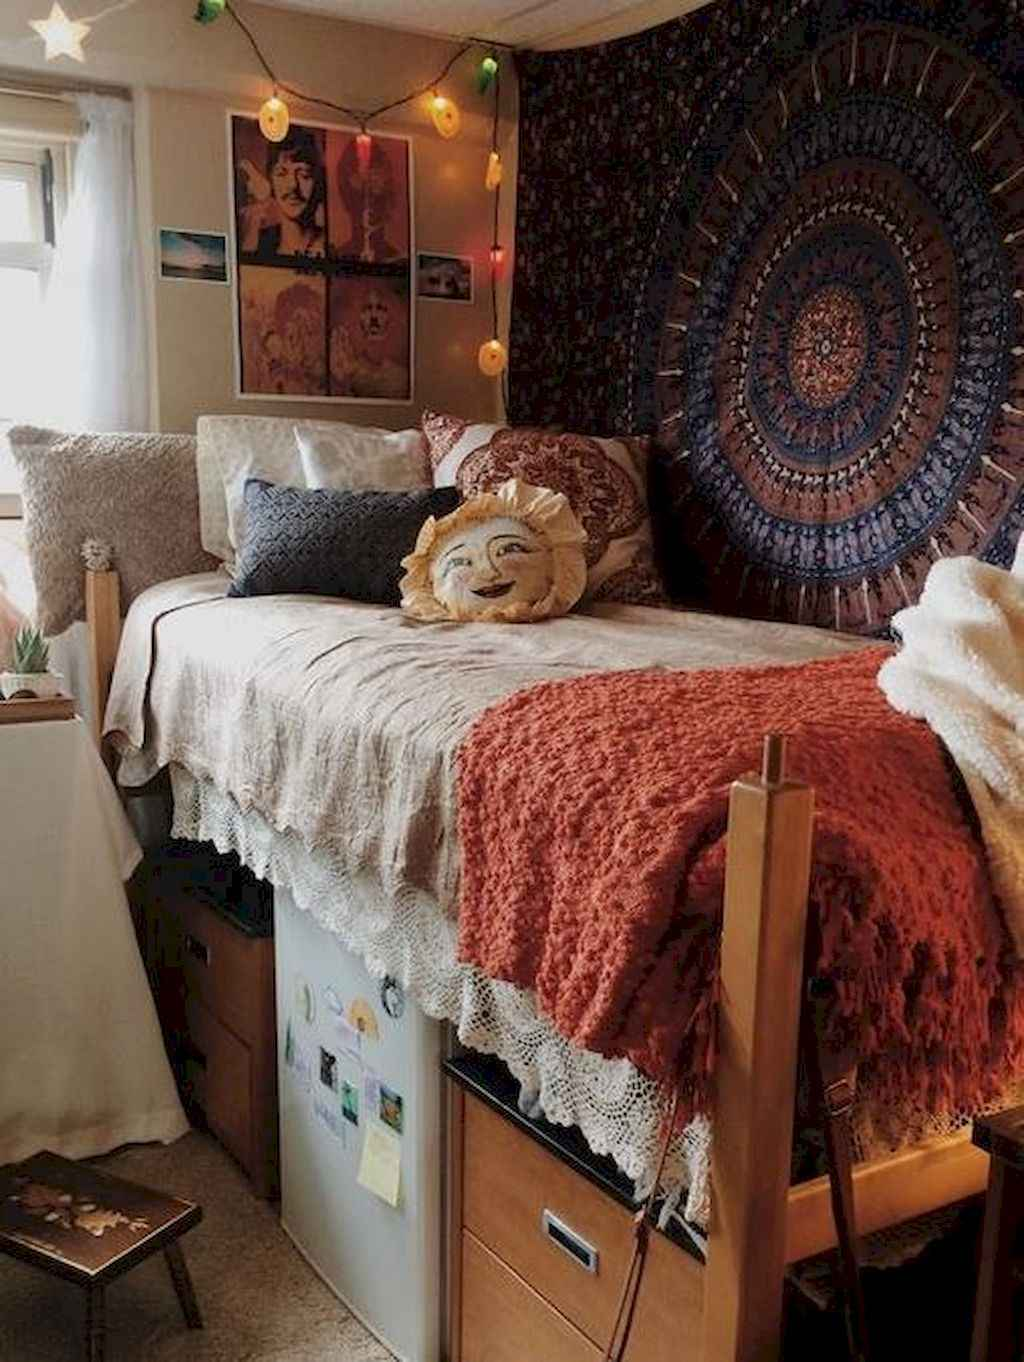 Cute diy dorm room decorating ideas on a budget (62)